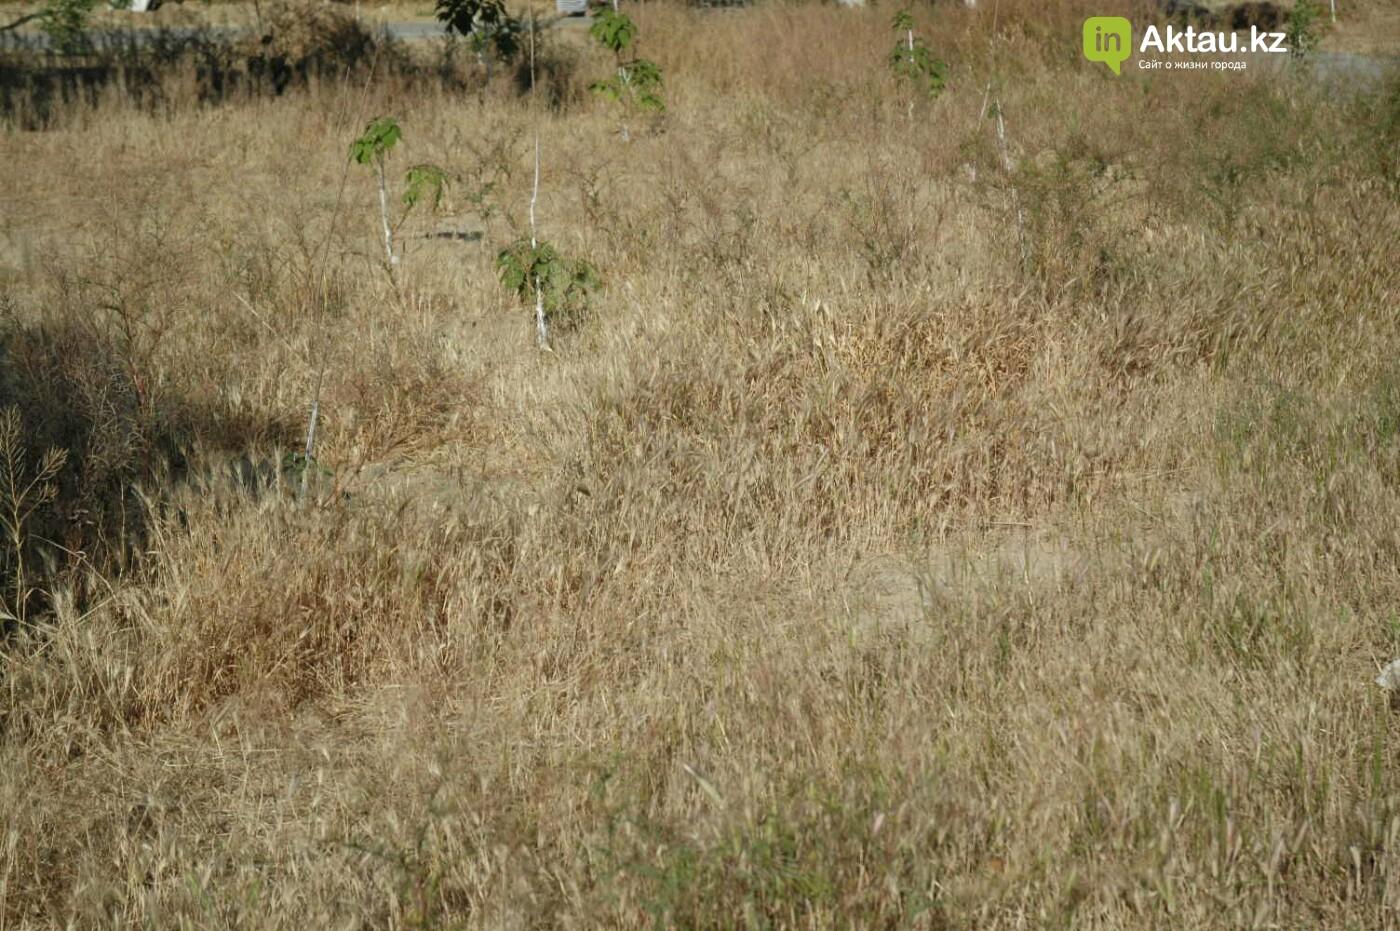 Погибшие от засухи и обезвоживания в Актау исчисляются десятками (ФОТО), фото-38